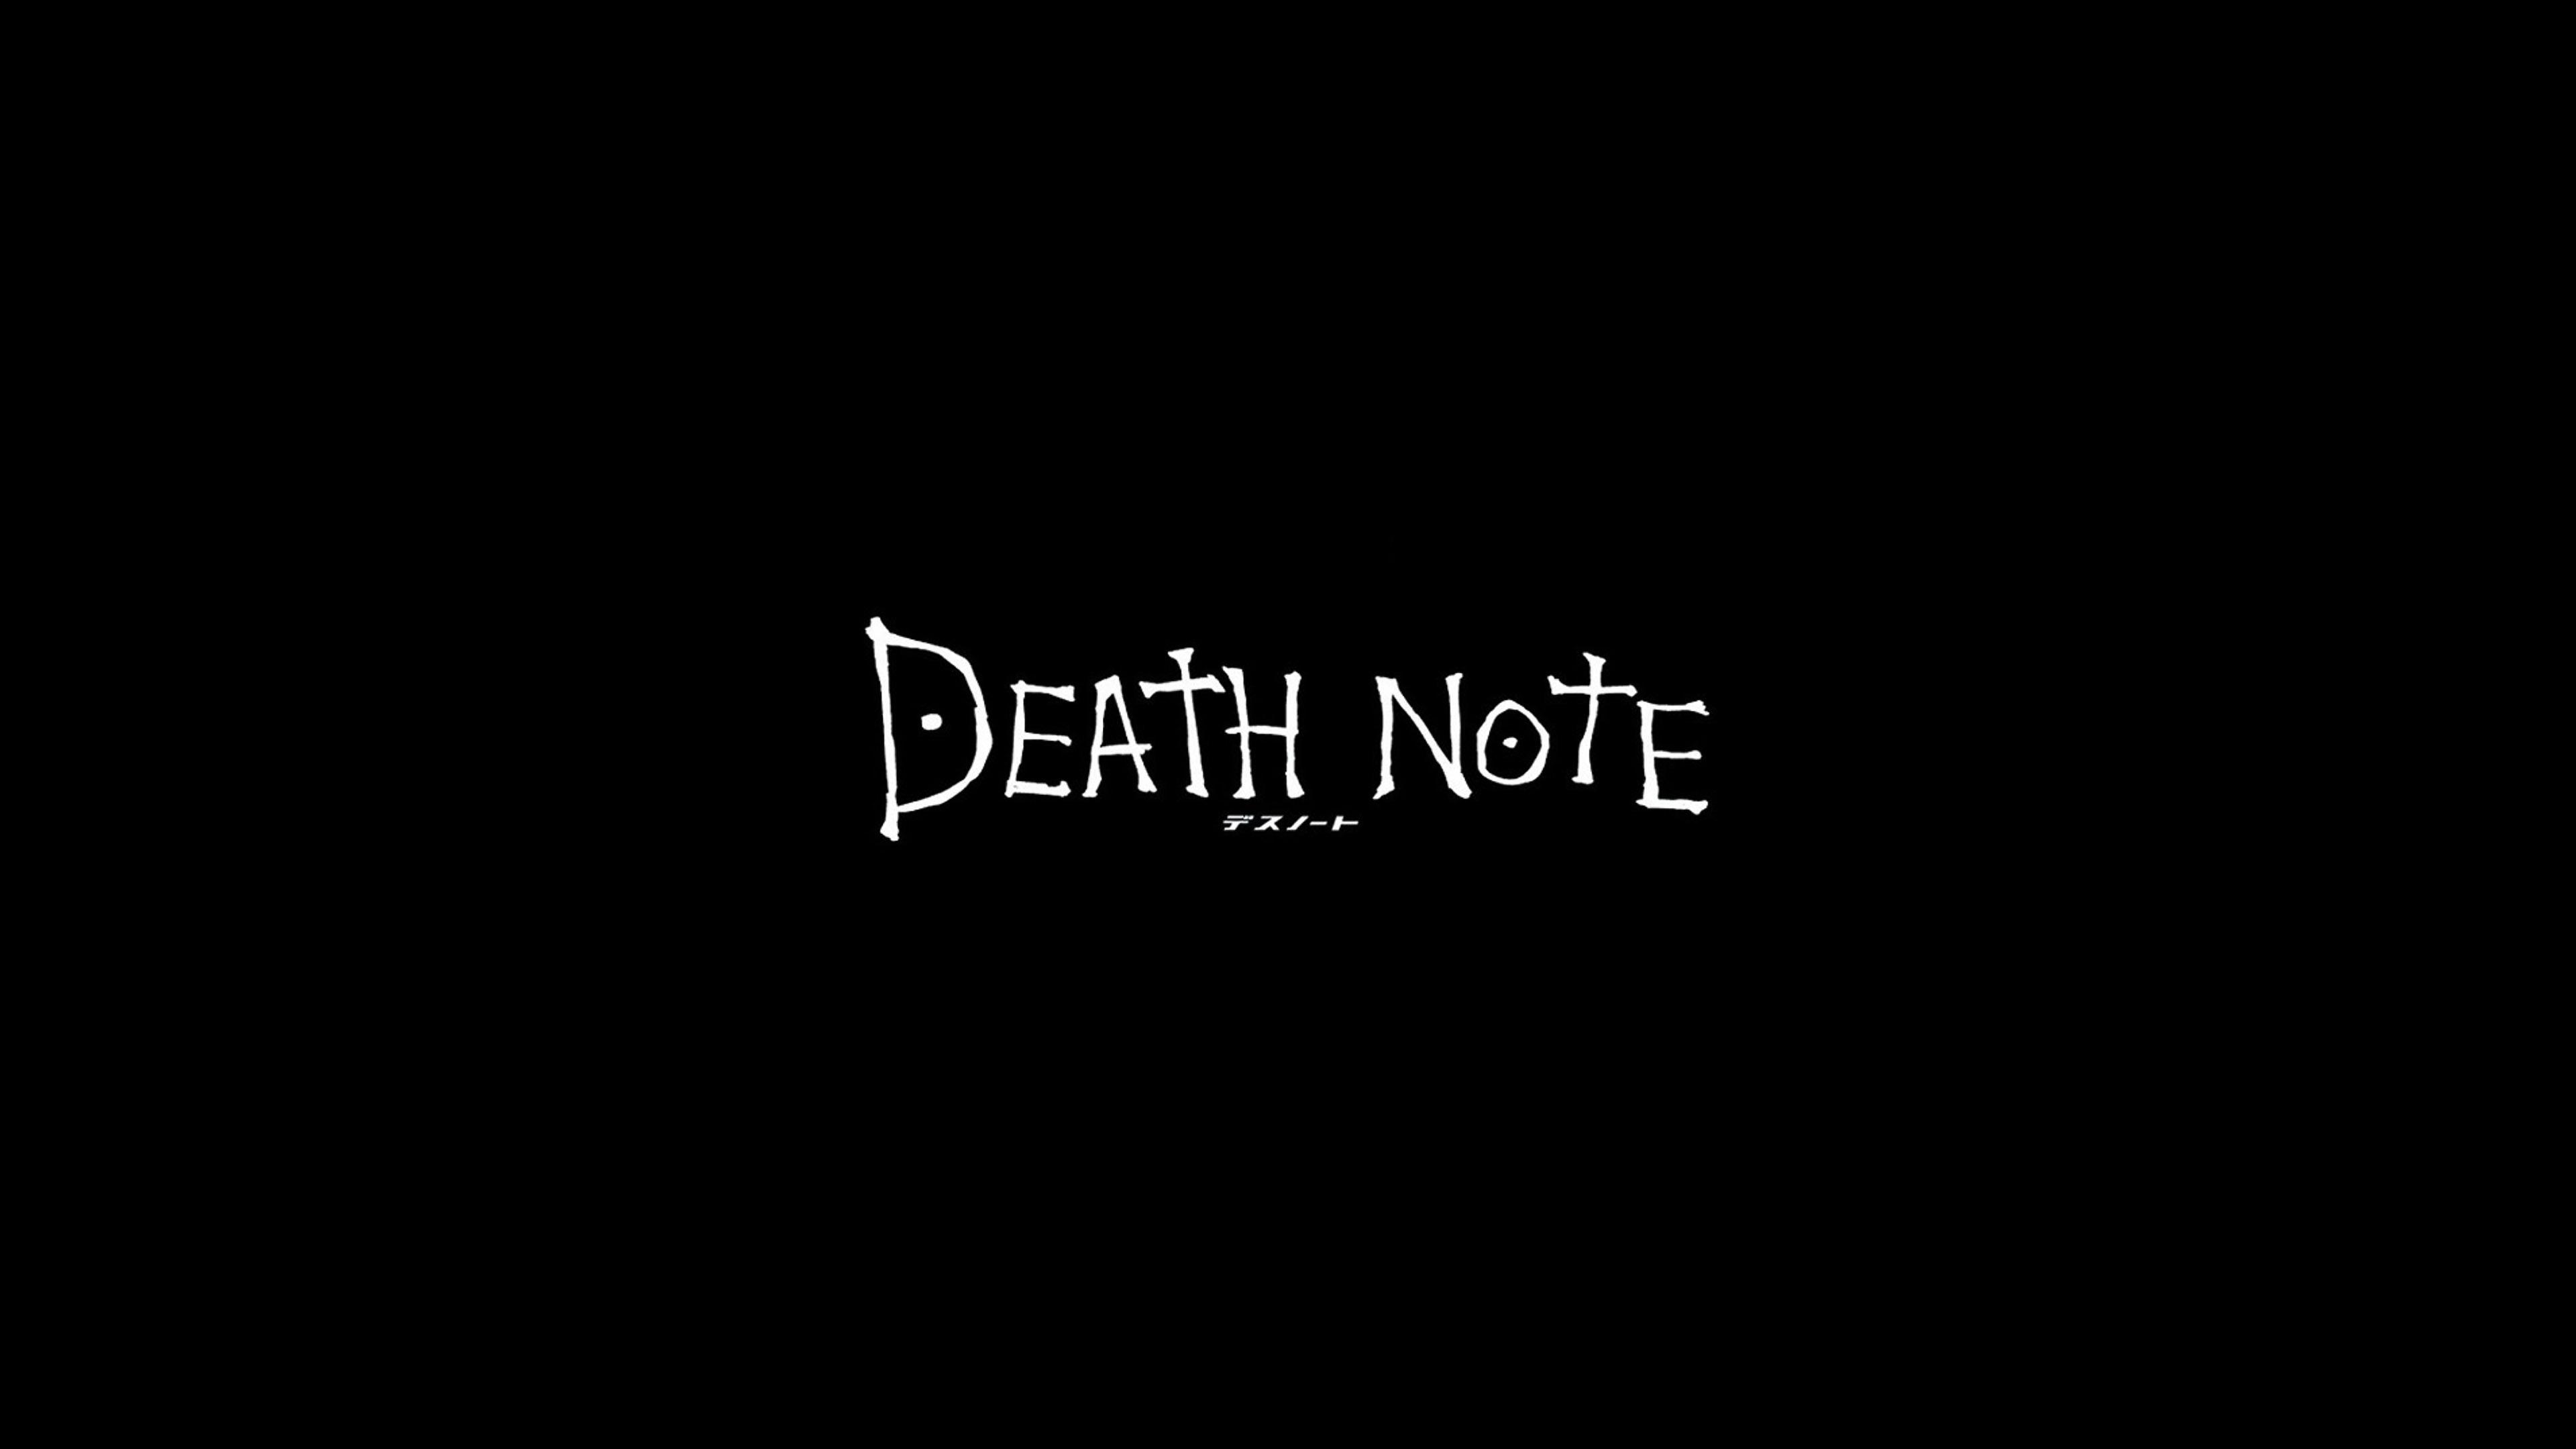 Cute Cartoon Fall Wallpaper Ac77 Wallpaper Death Note Cartoon Illust Minimal Papers Co